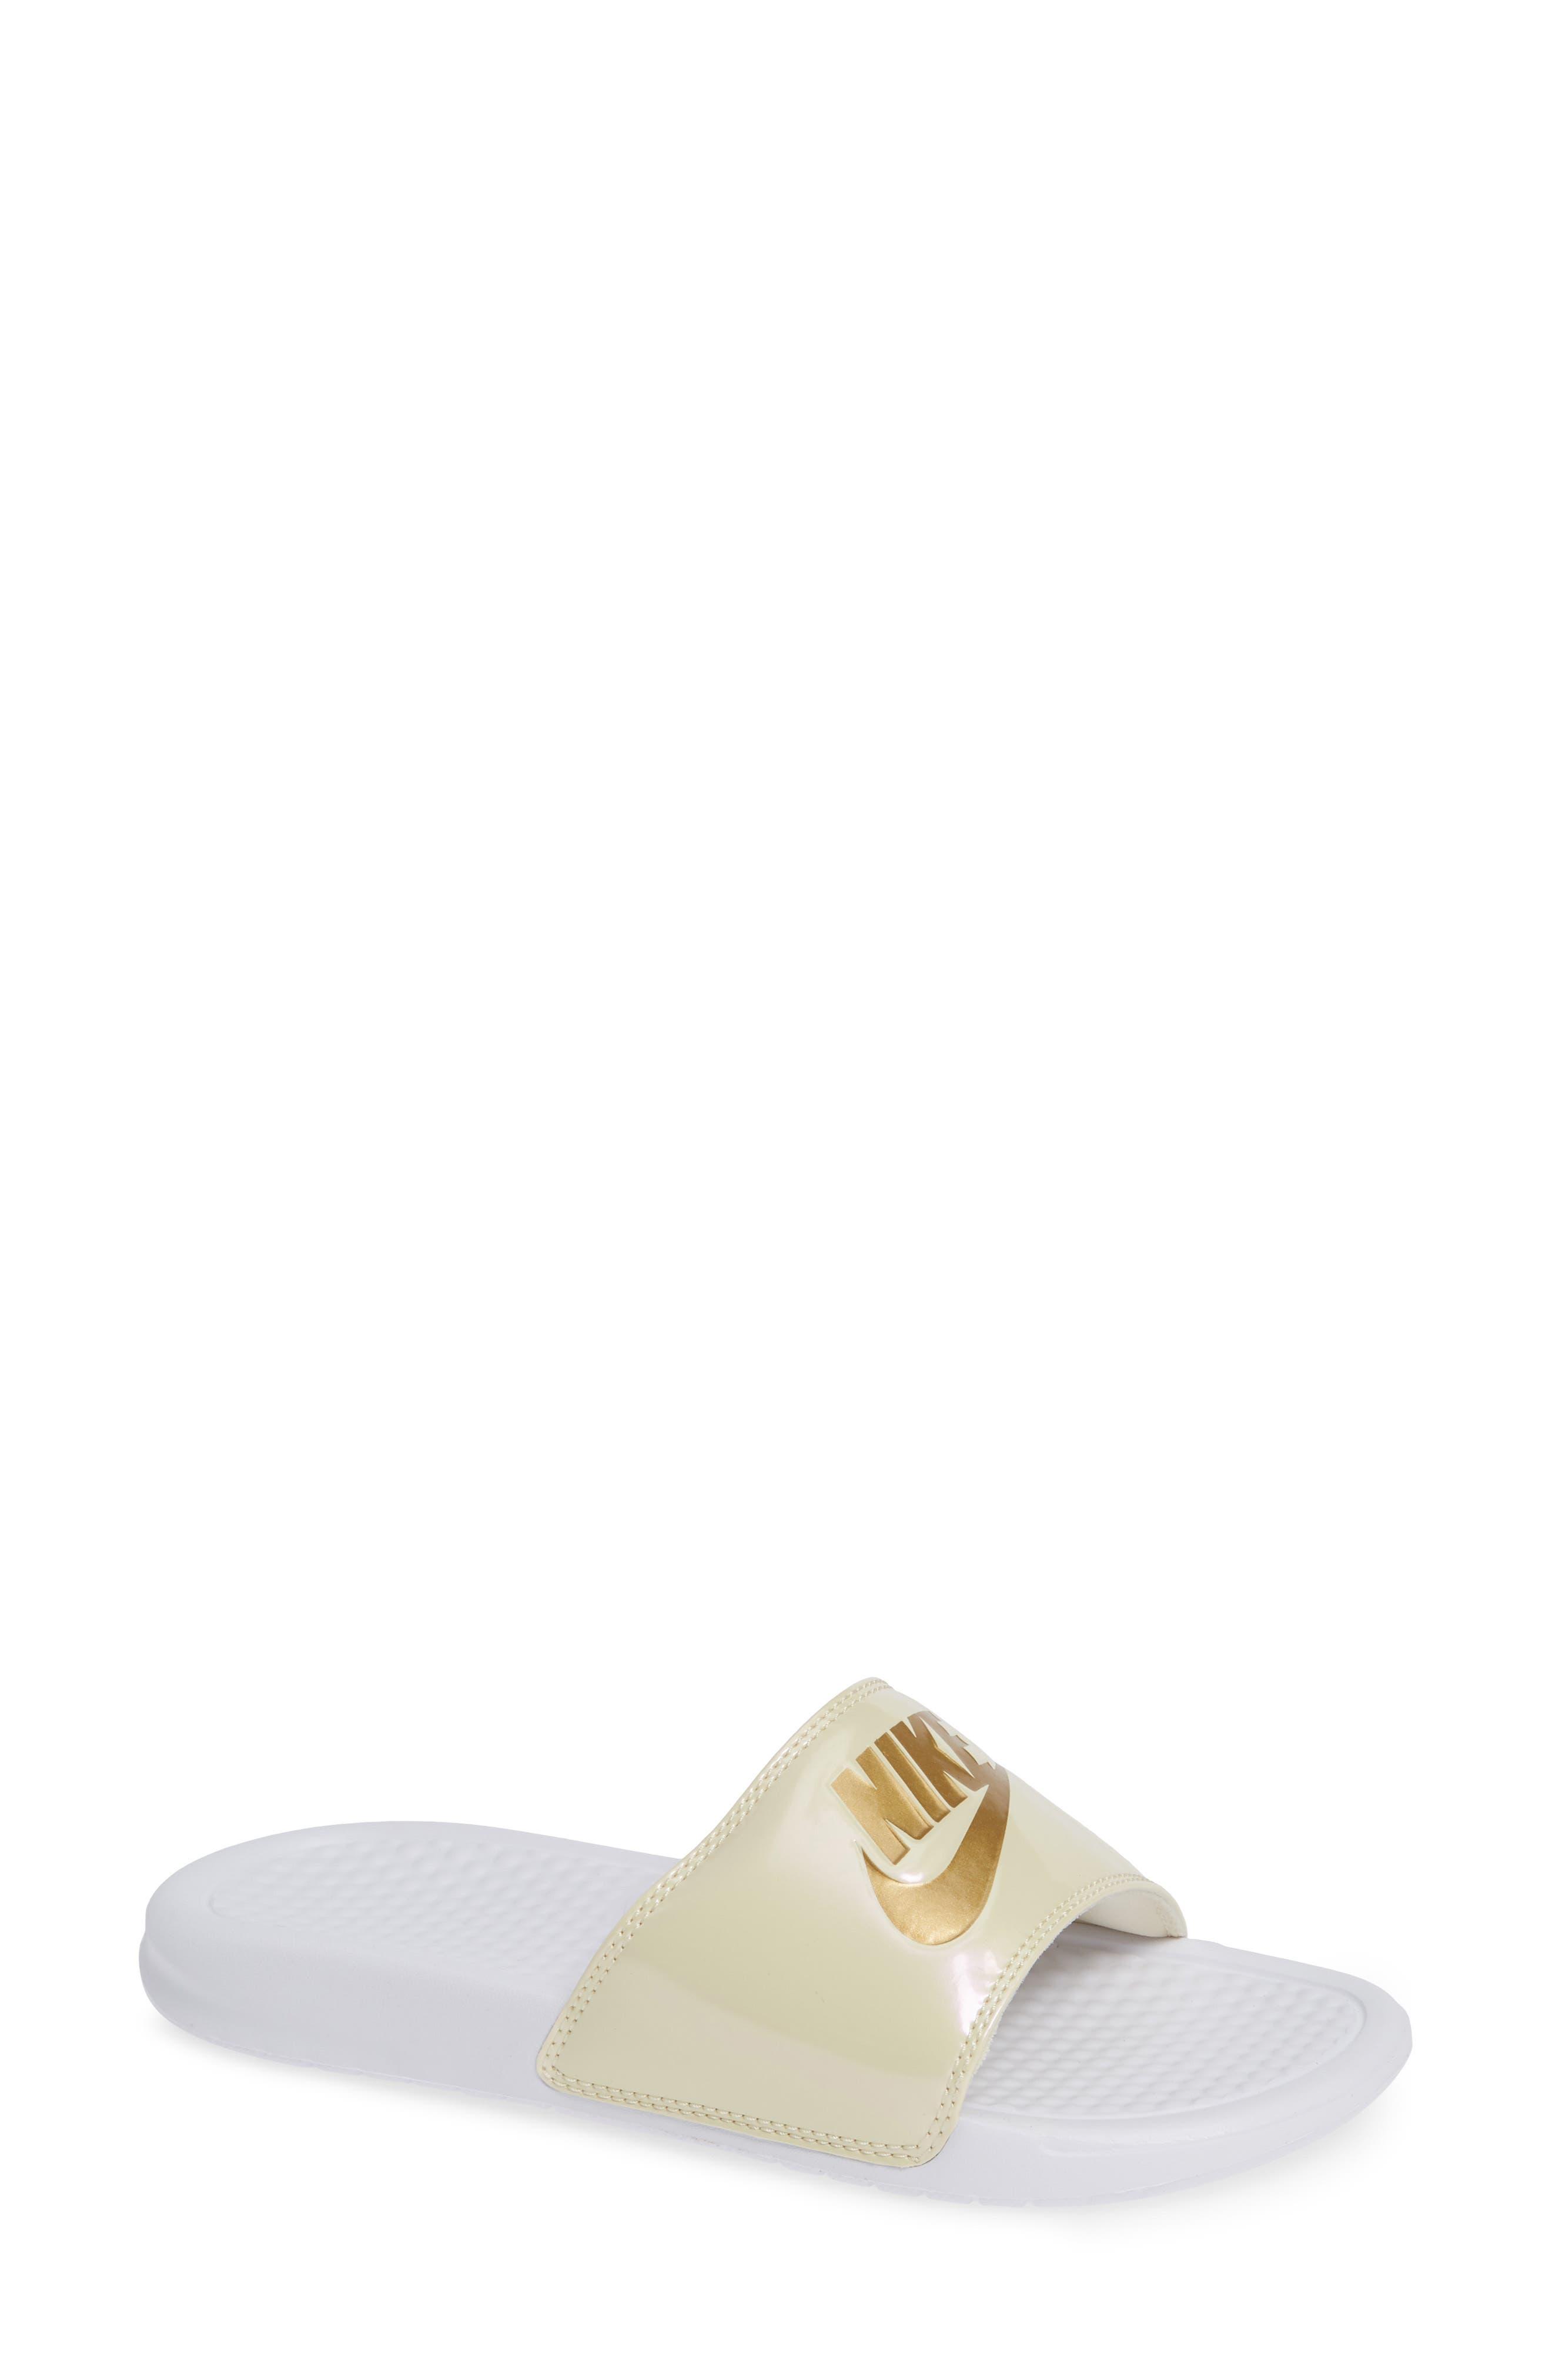 Benassi Just Do It Print Sandal,                             Main thumbnail 1, color,                             WHITE/ METALLIC GOLD/ BEACH